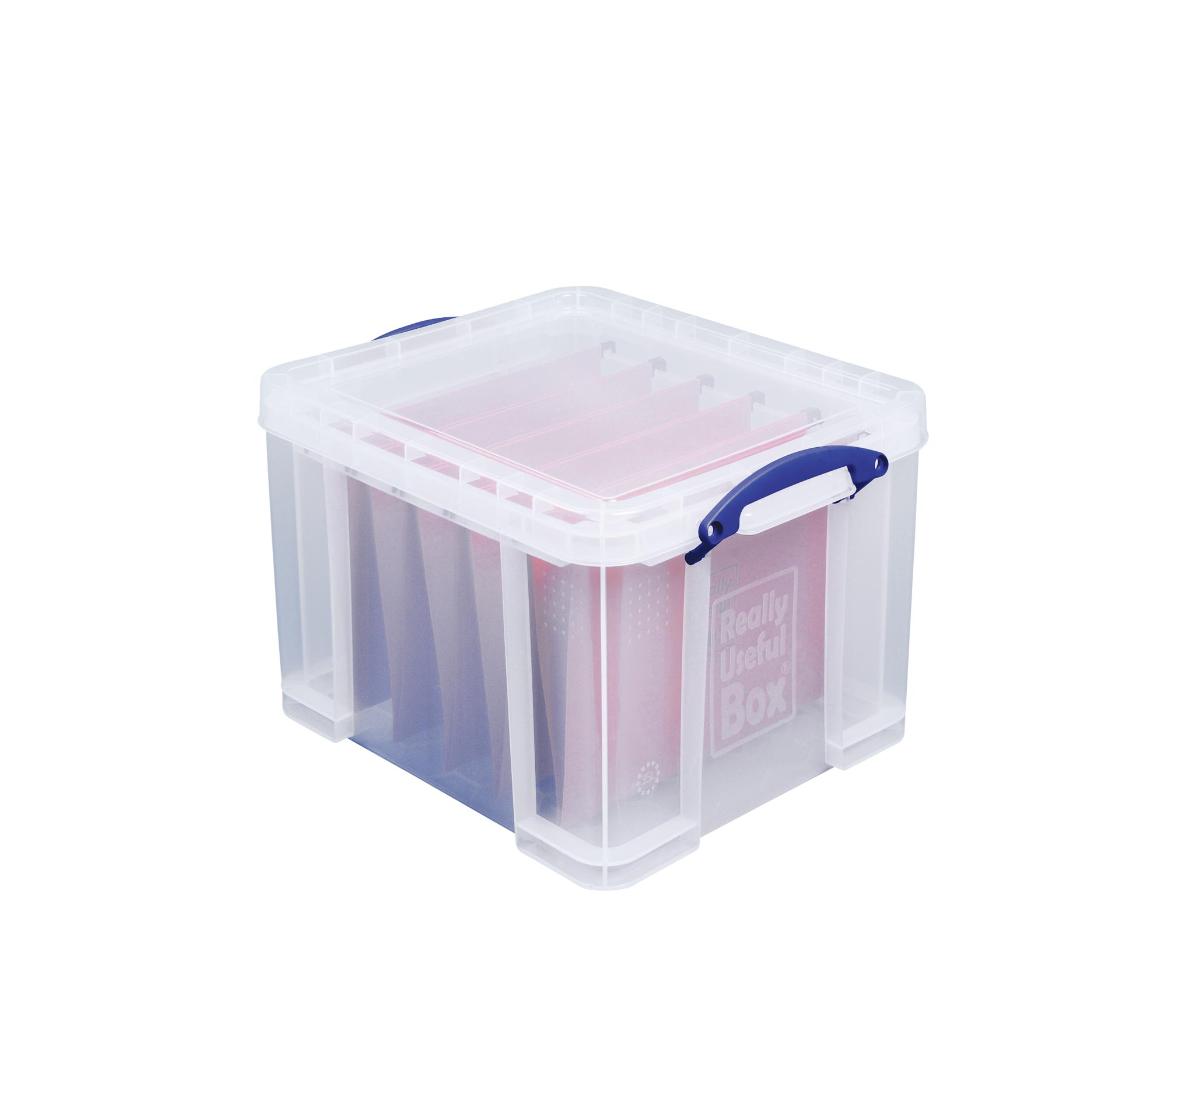 Really Useful Box boîte de rangement 35 litre, transparant